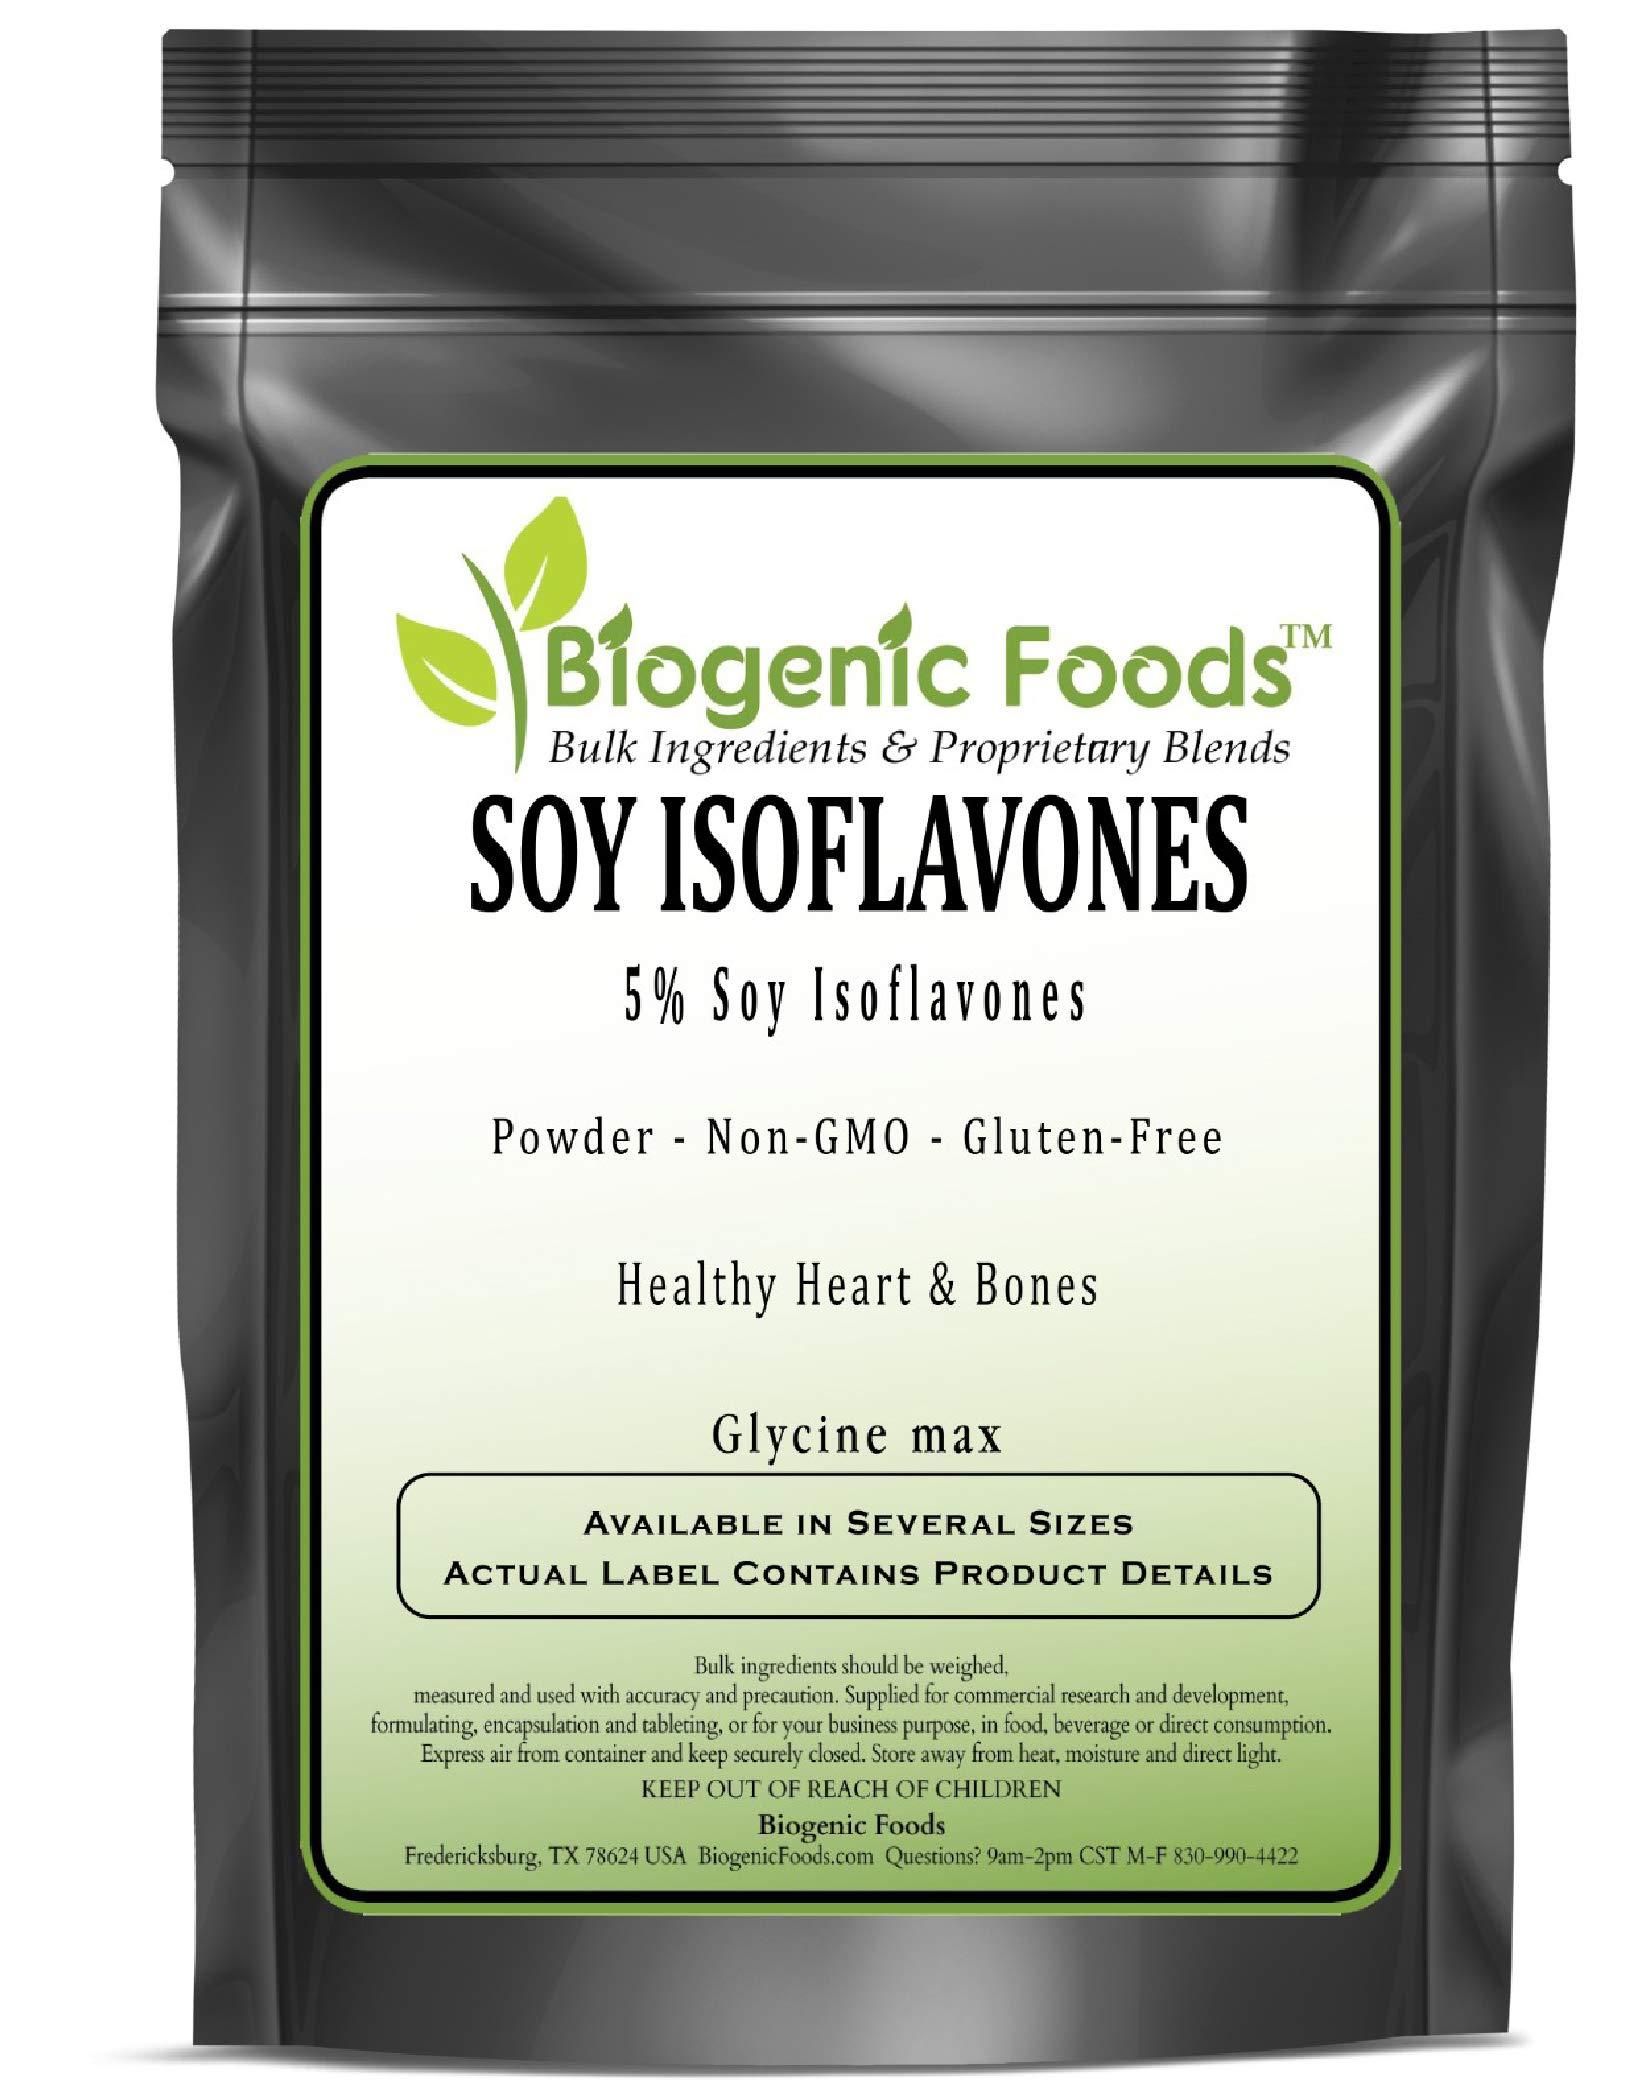 Soy Isoflavones - 5% Soy Isoflavones Powder Extract (Glycine max), 25 kg